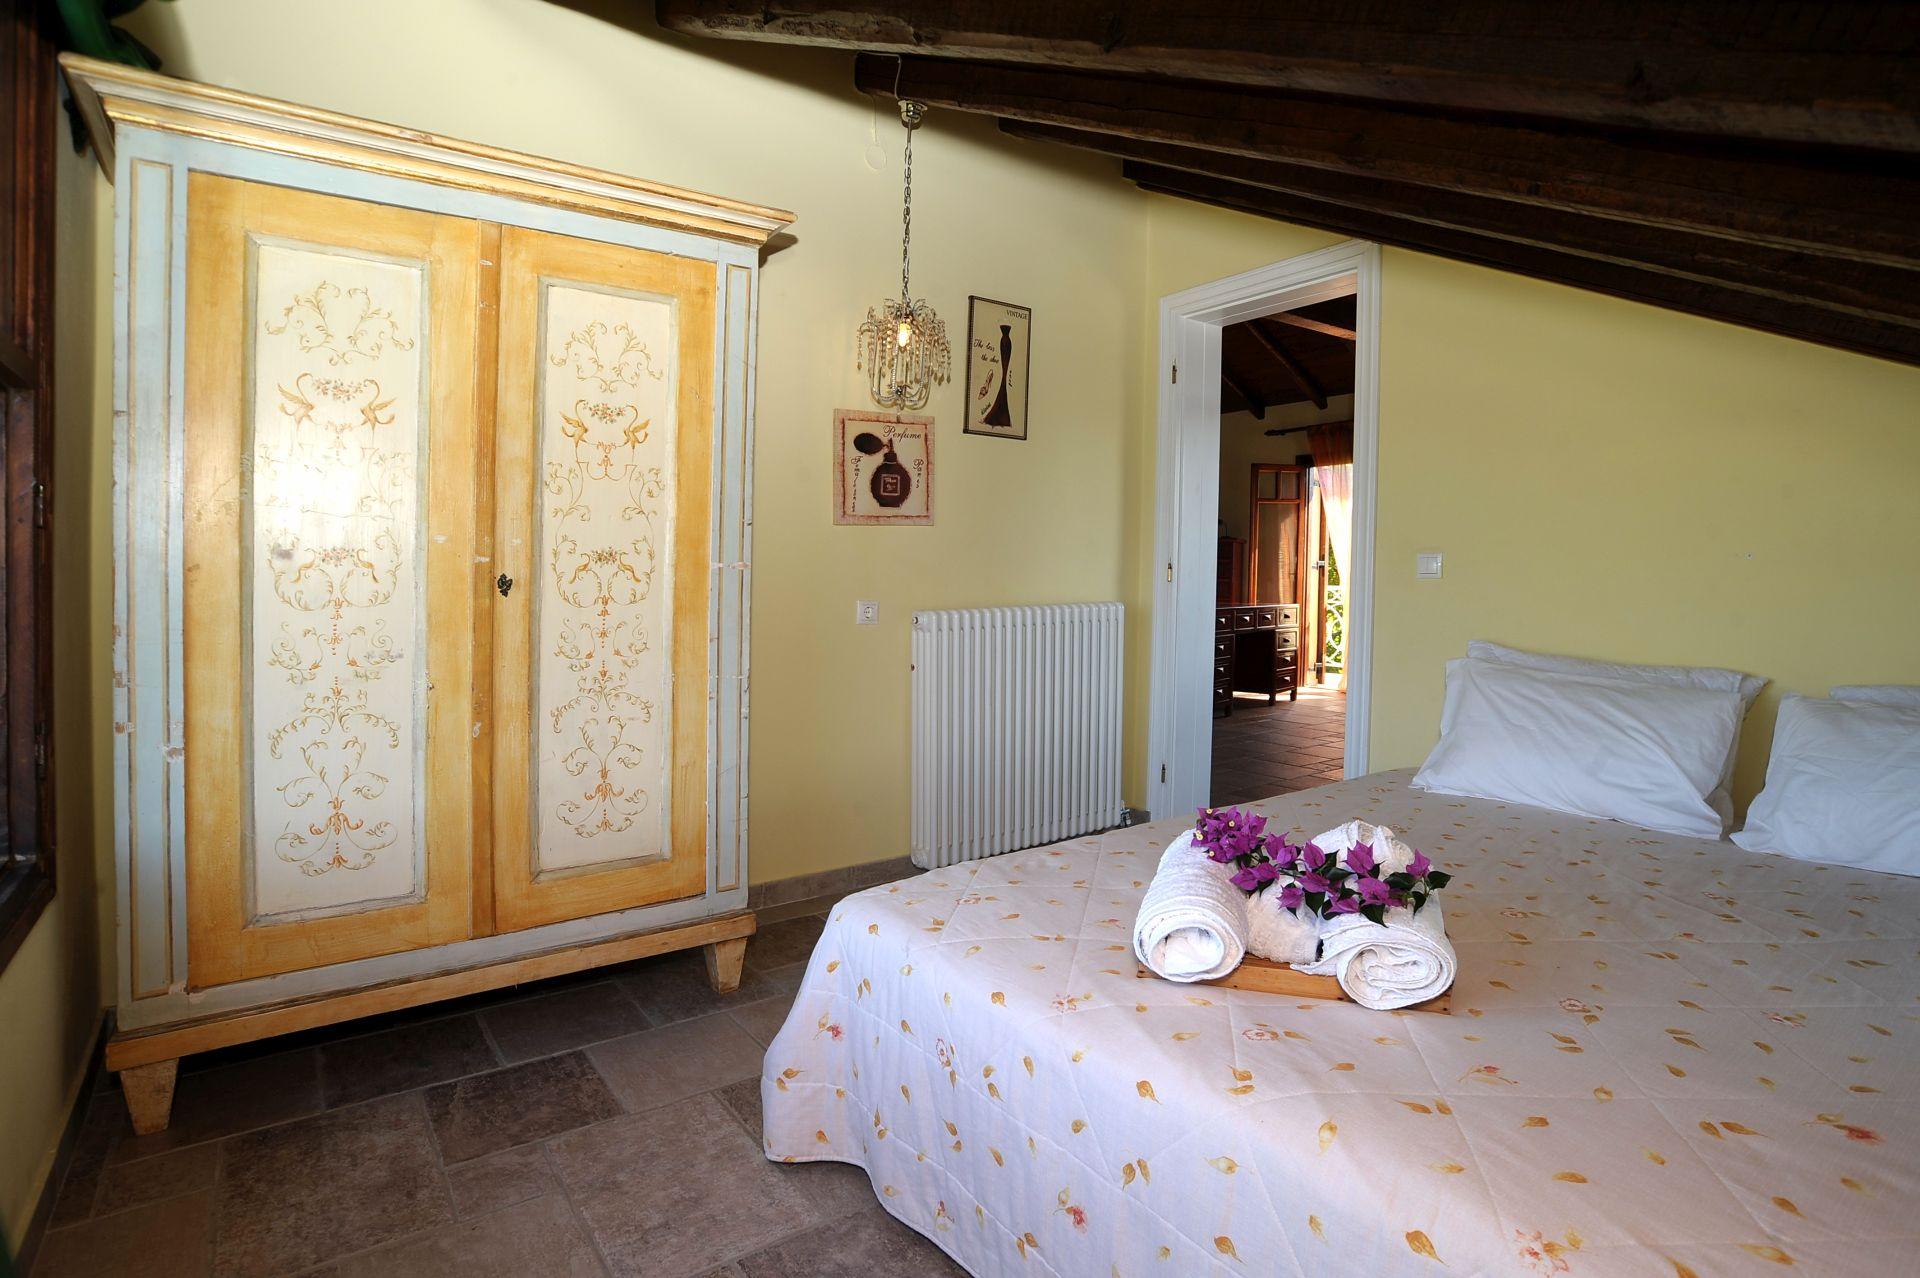 Schlafzimmer 2 oben - Korfu Strandvilla Meliti, Kanouli, Agios Matheos, Korfu, KorfuCorfu